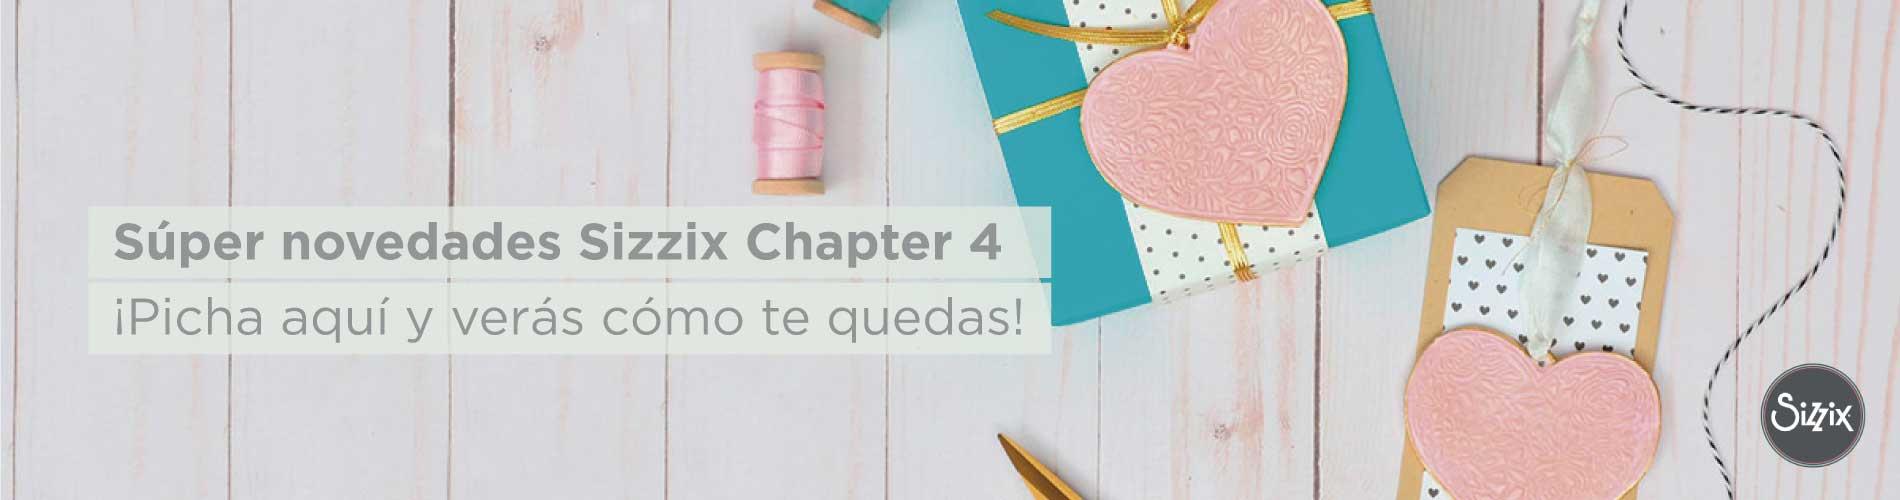 Novedad Sizzix Chapter 4